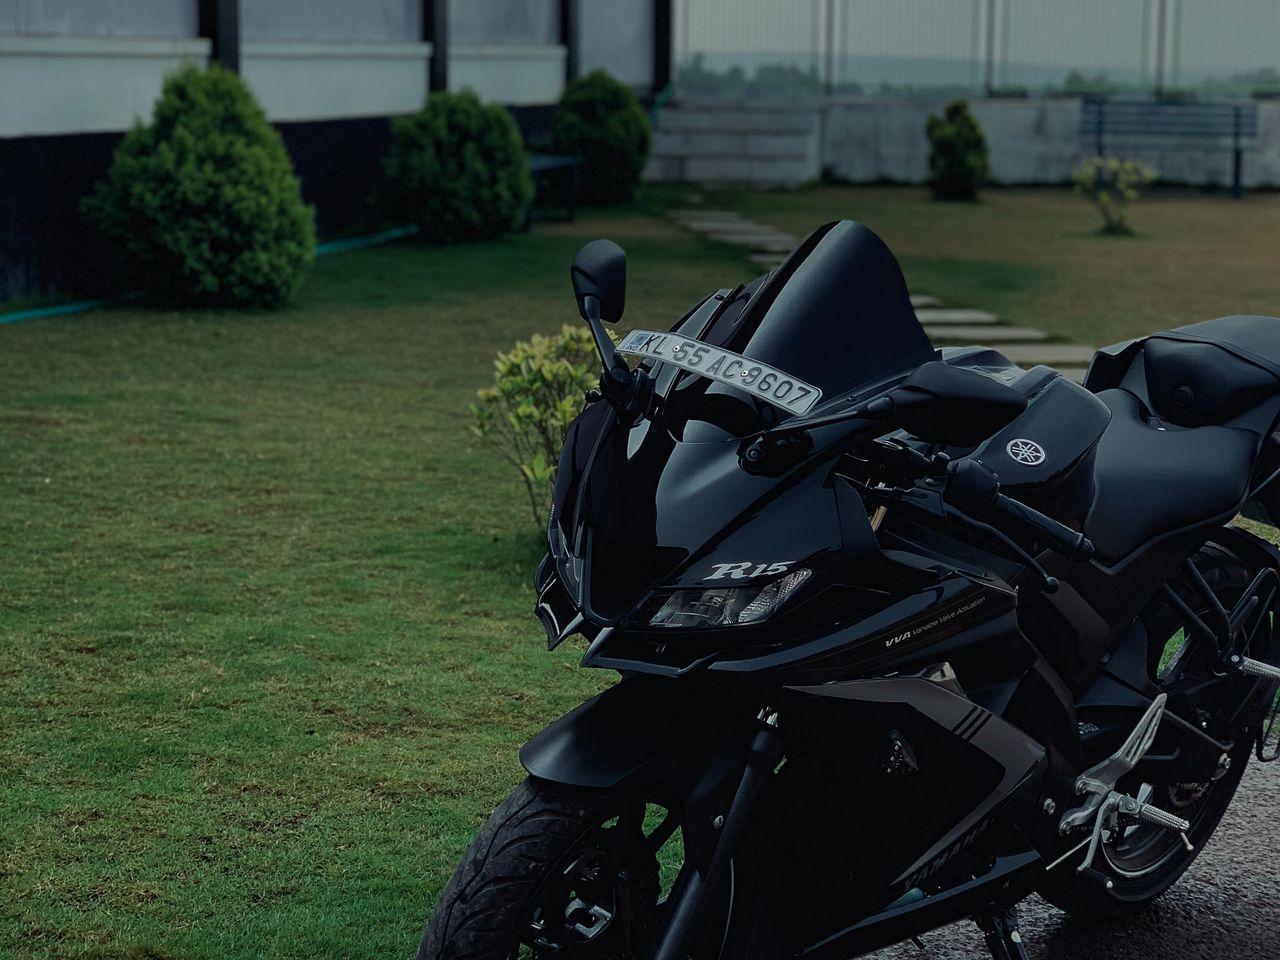 1280x960 Wallpaper yamaha r15, yamaha, motorcycle, bike, black